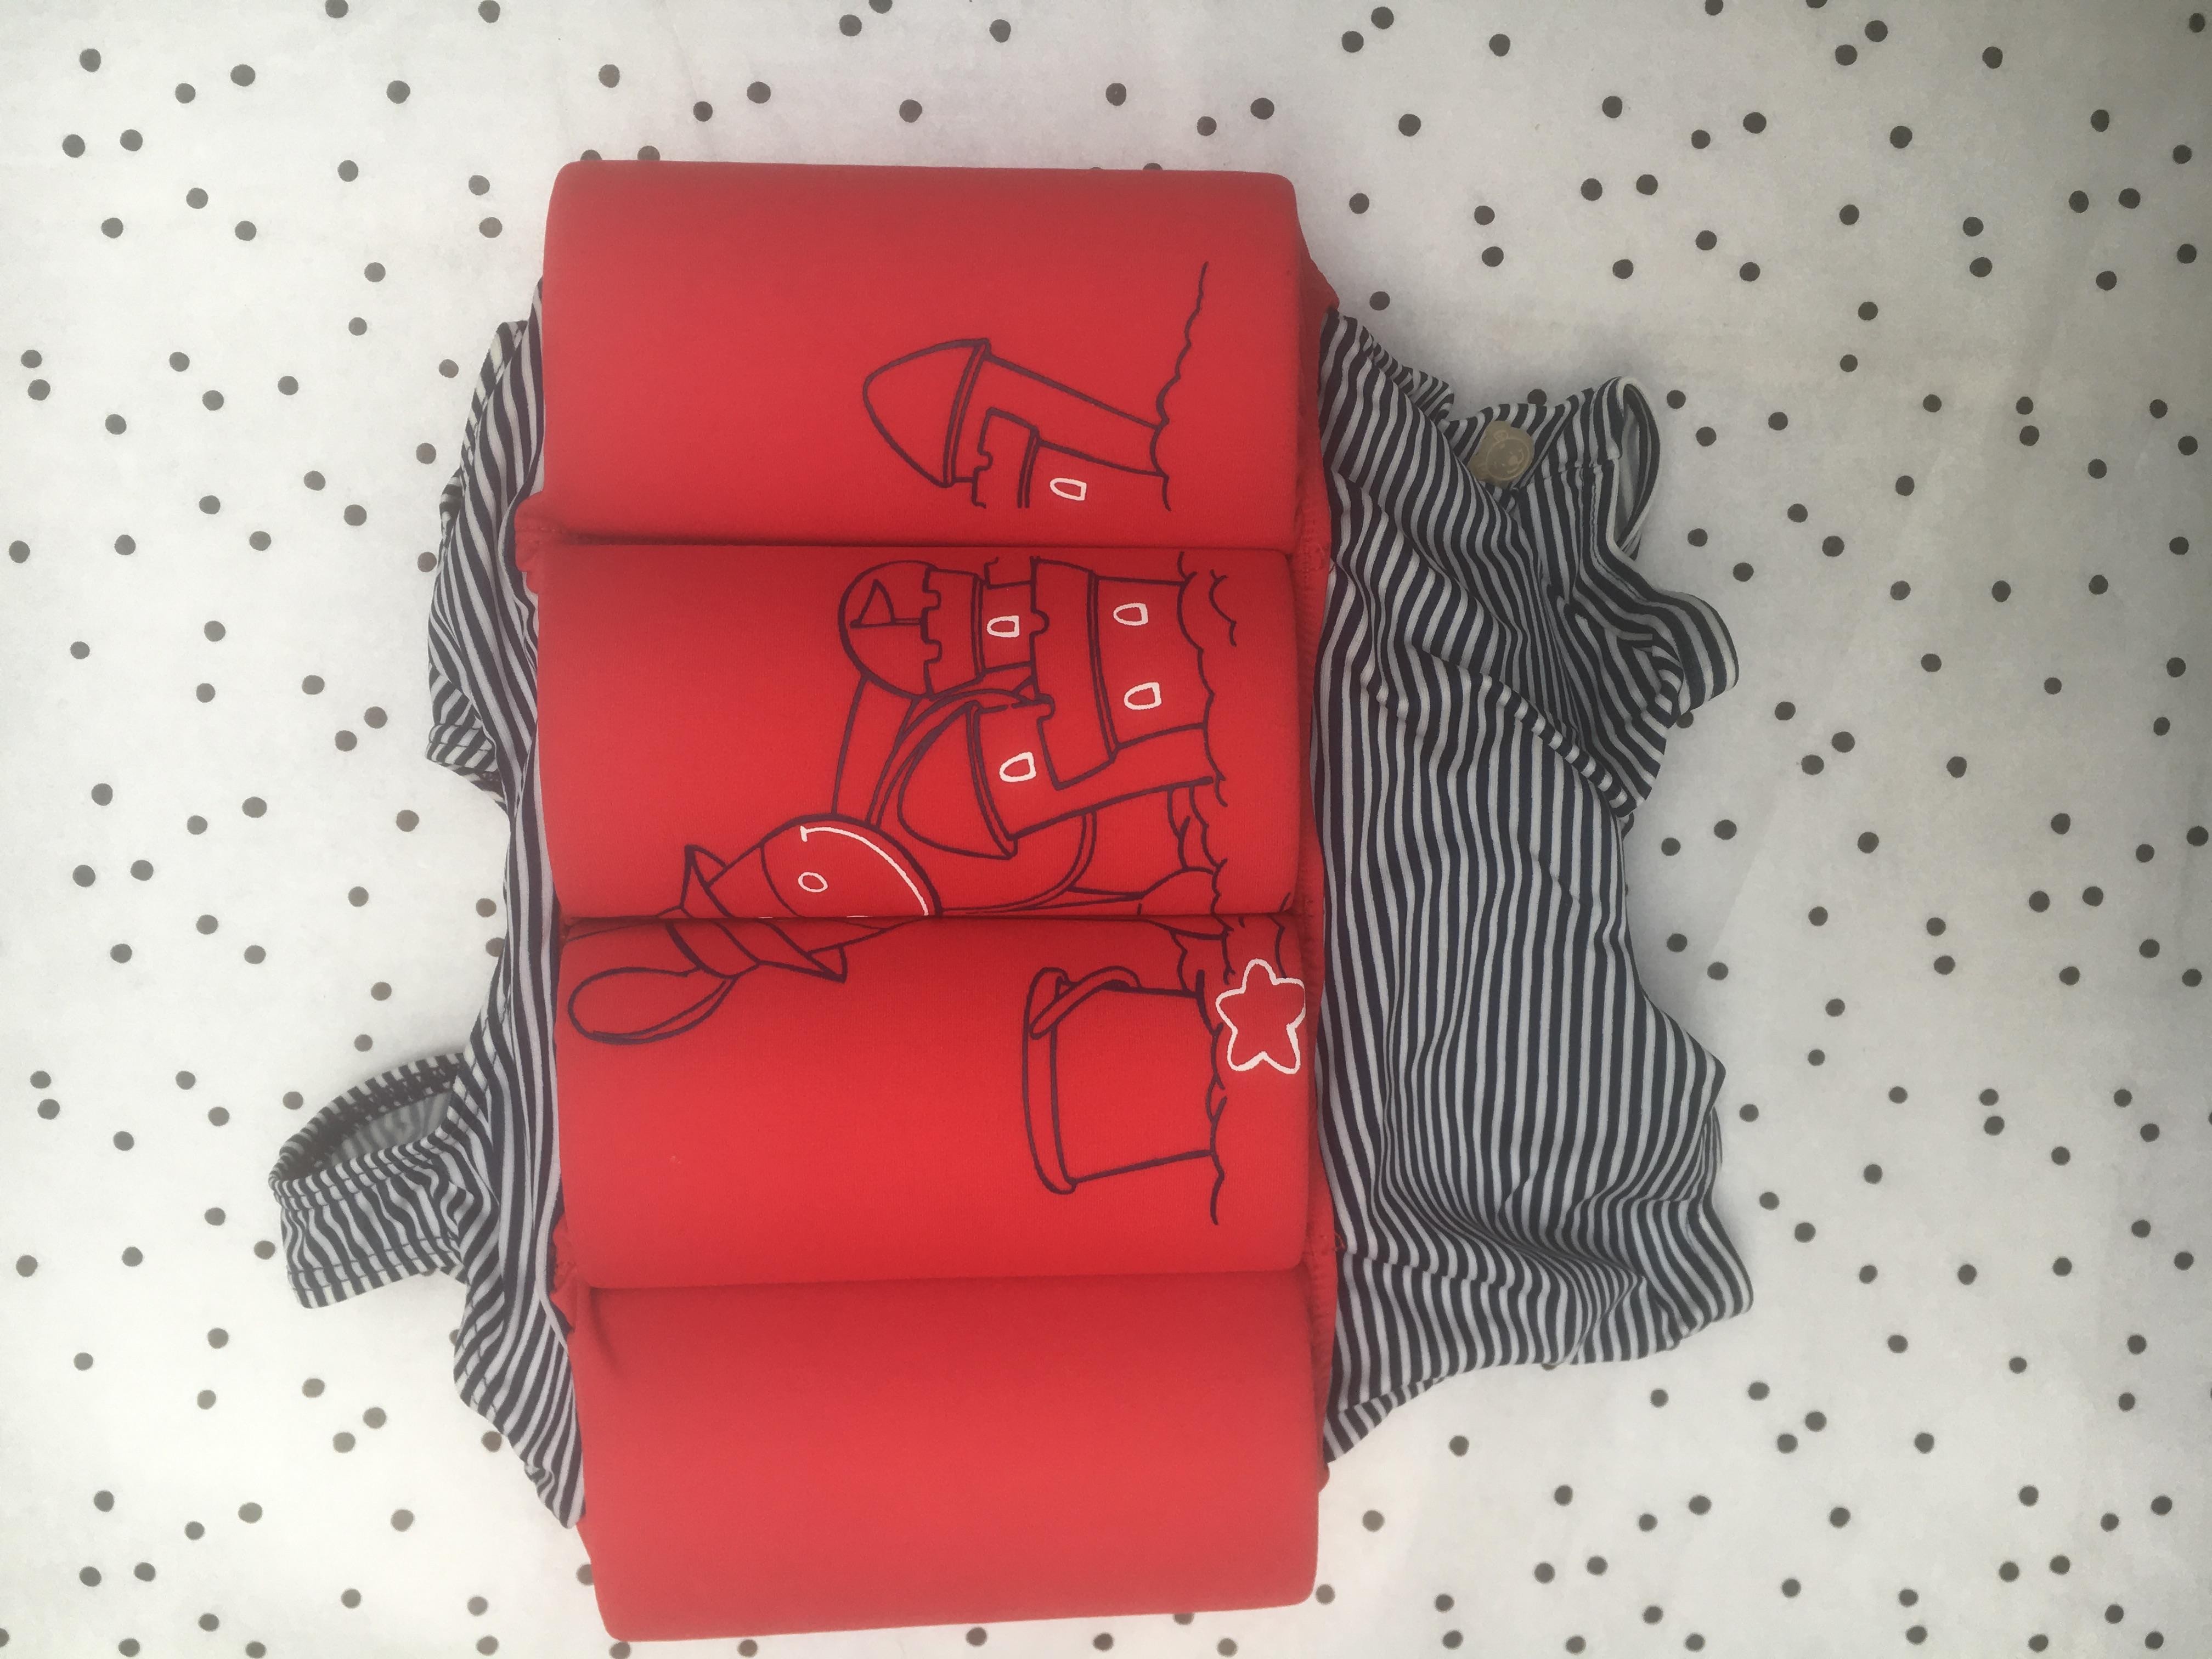 Noukies boeibadpak rood / blauwe strepen 12M